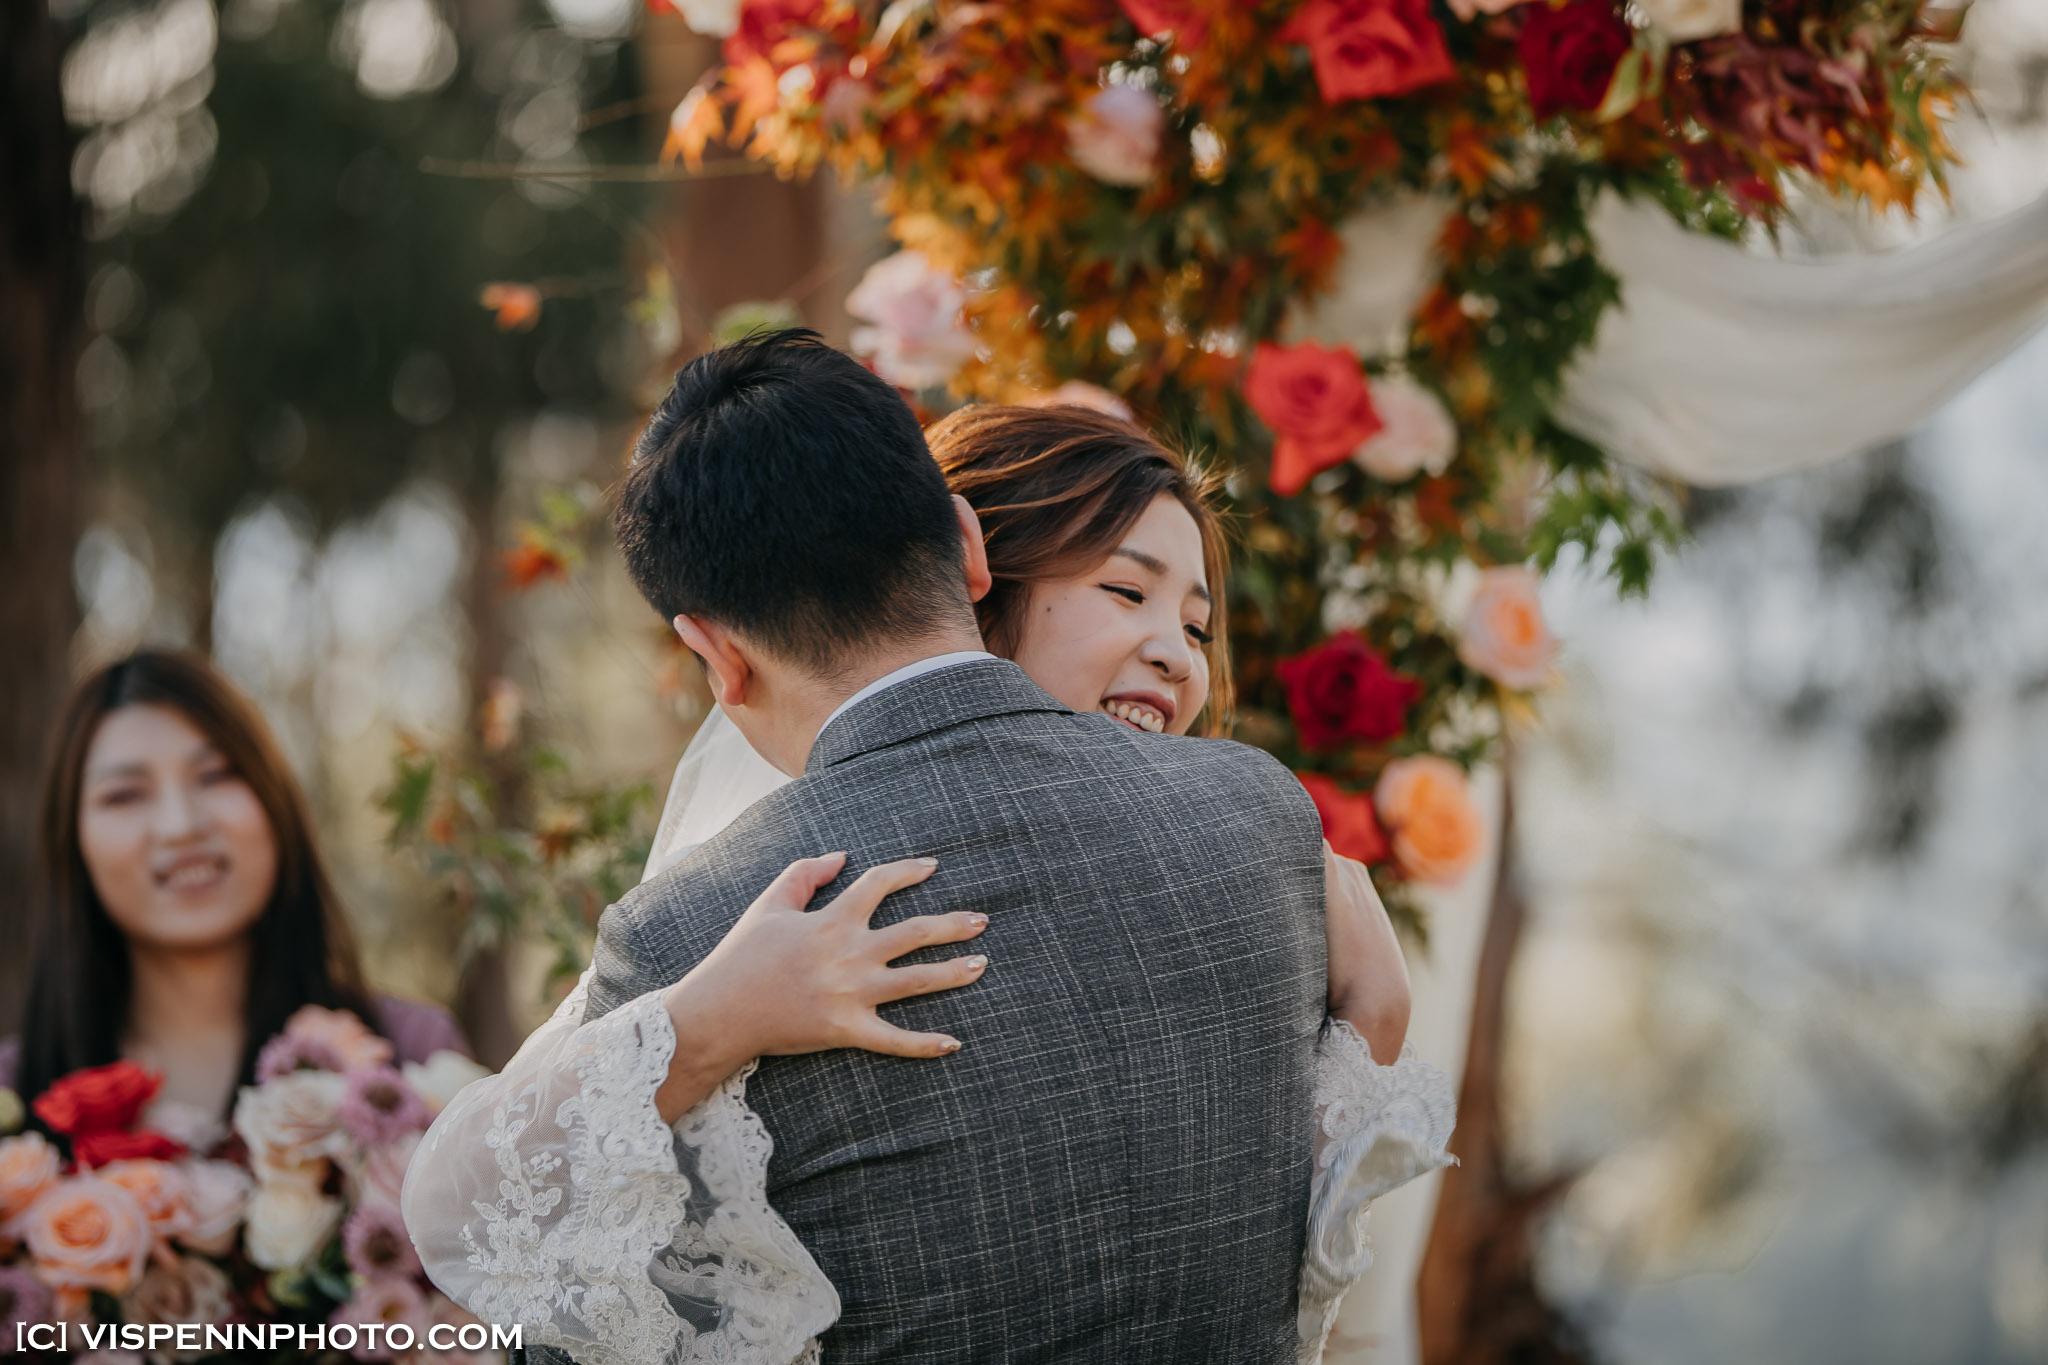 WEDDING DAY Photography Melbourne VISPENN 墨尔本 婚礼跟拍 婚礼摄像 婚礼摄影 结婚照 登记照 DominicHelen 2P 5763 1DX2 VISPENN